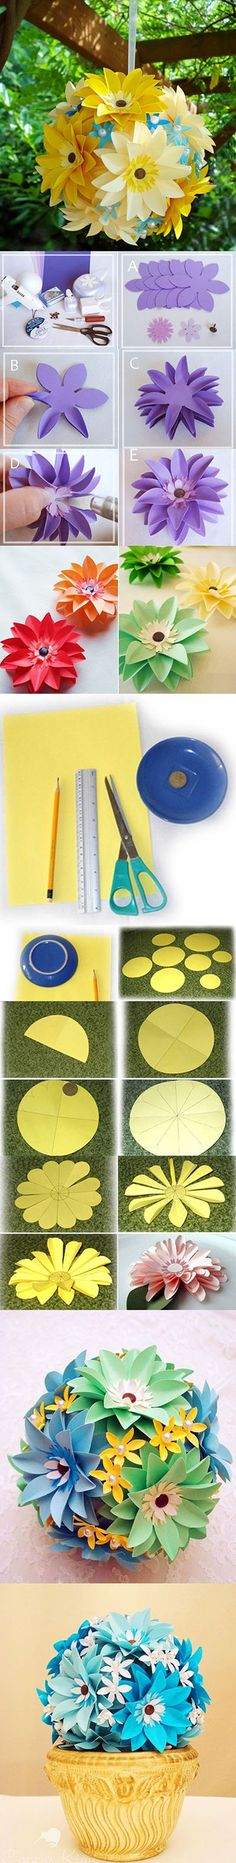 DIY Easy Paper Flower Ball in 2 Ways   DIY & Crafts Tutorials